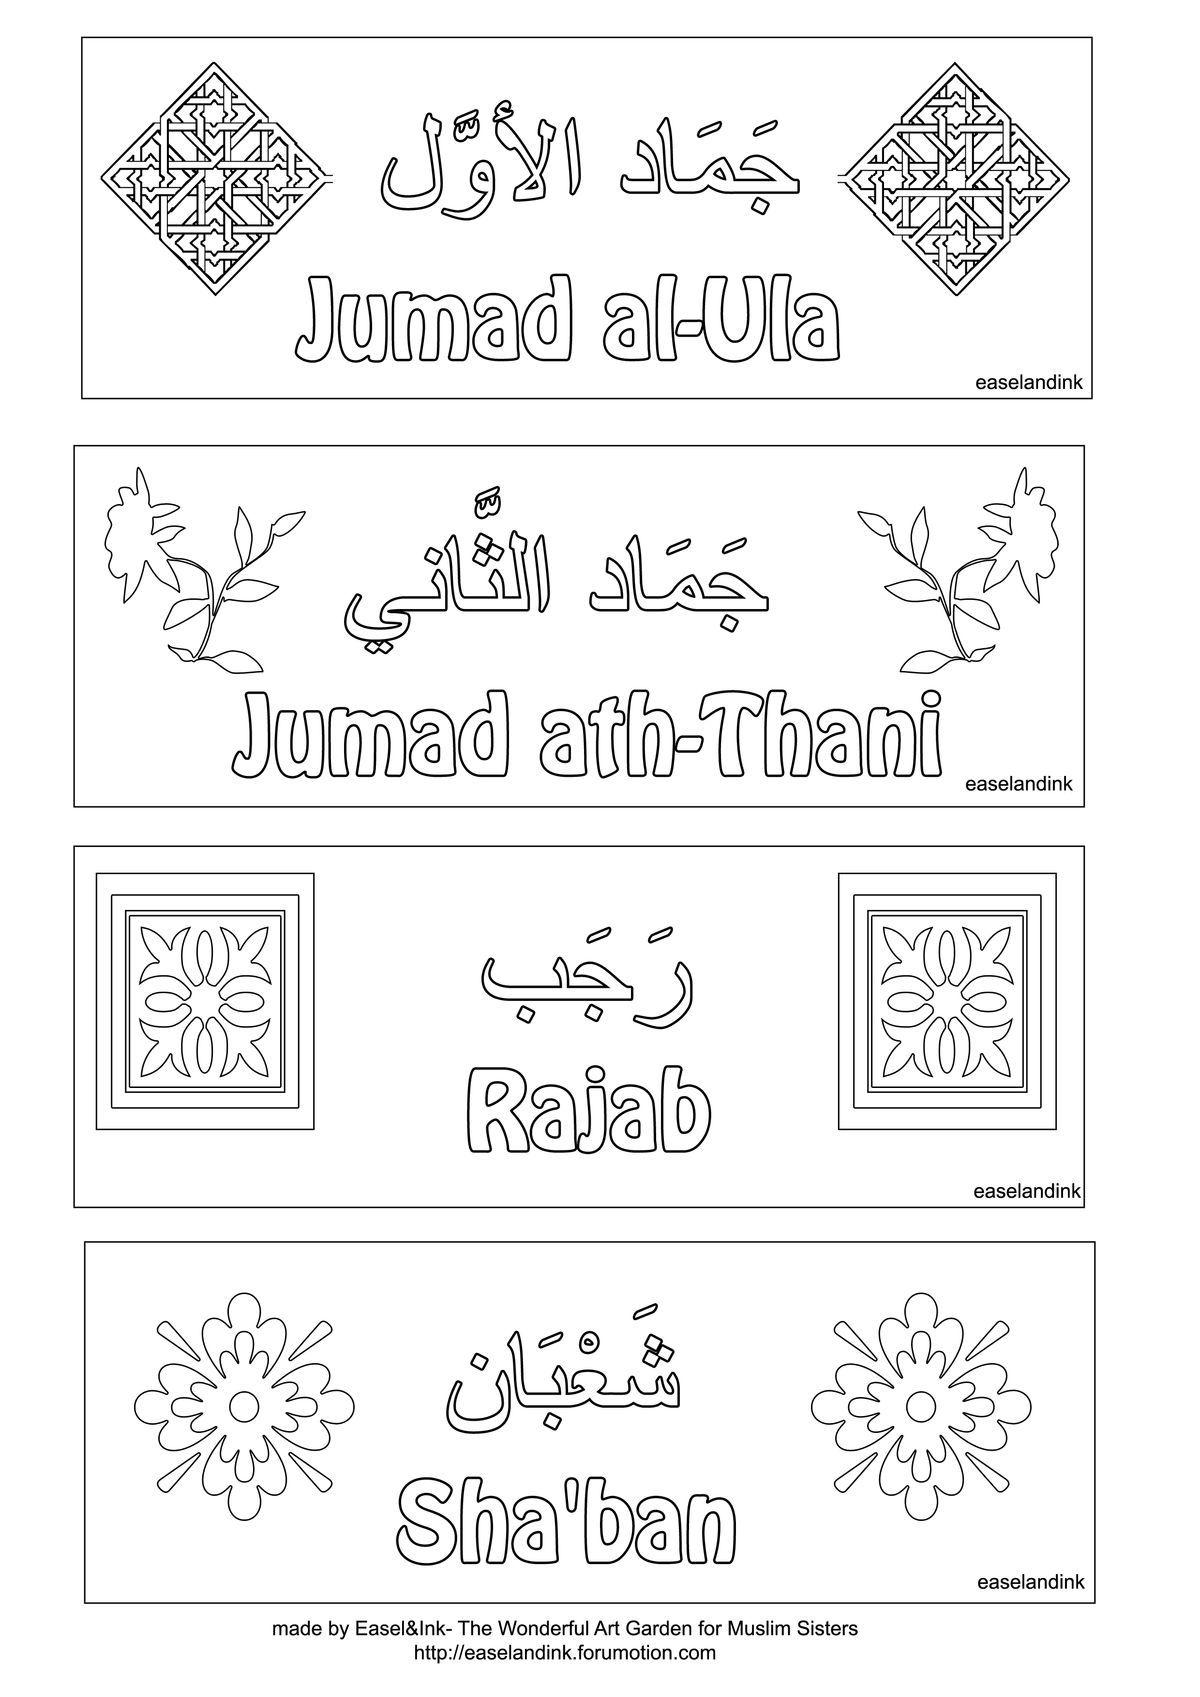 356f77e376fa0935625ff4eba02151d0 Jpg 1 200 1 697 Pixels Islamic Kids Activities Islam For Kids Muslim Kids Activities